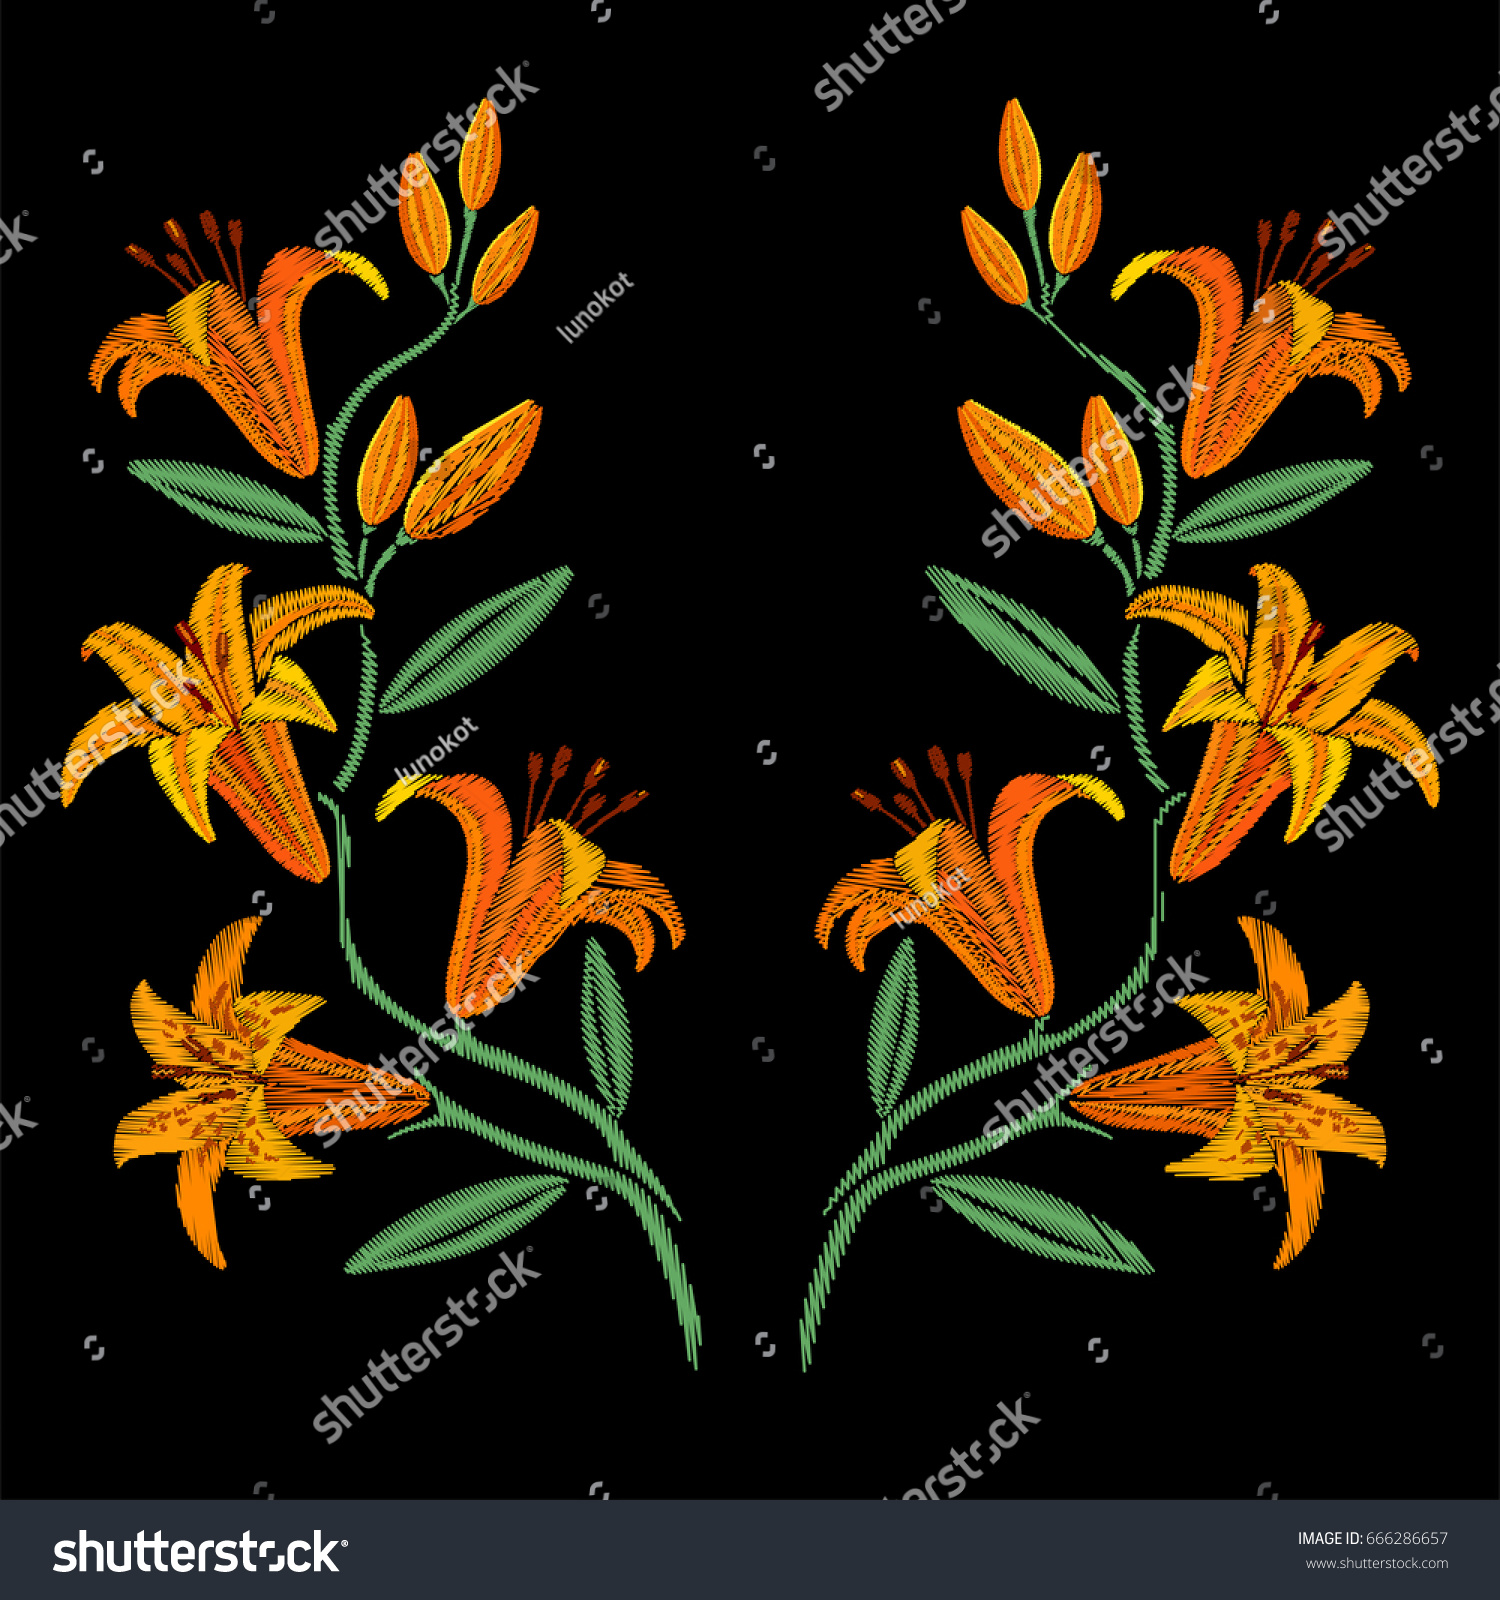 Embroidery symmetrical yellow lily flowers stock vector 666286657 embroidery symmetrical yellow lily flowers izmirmasajfo